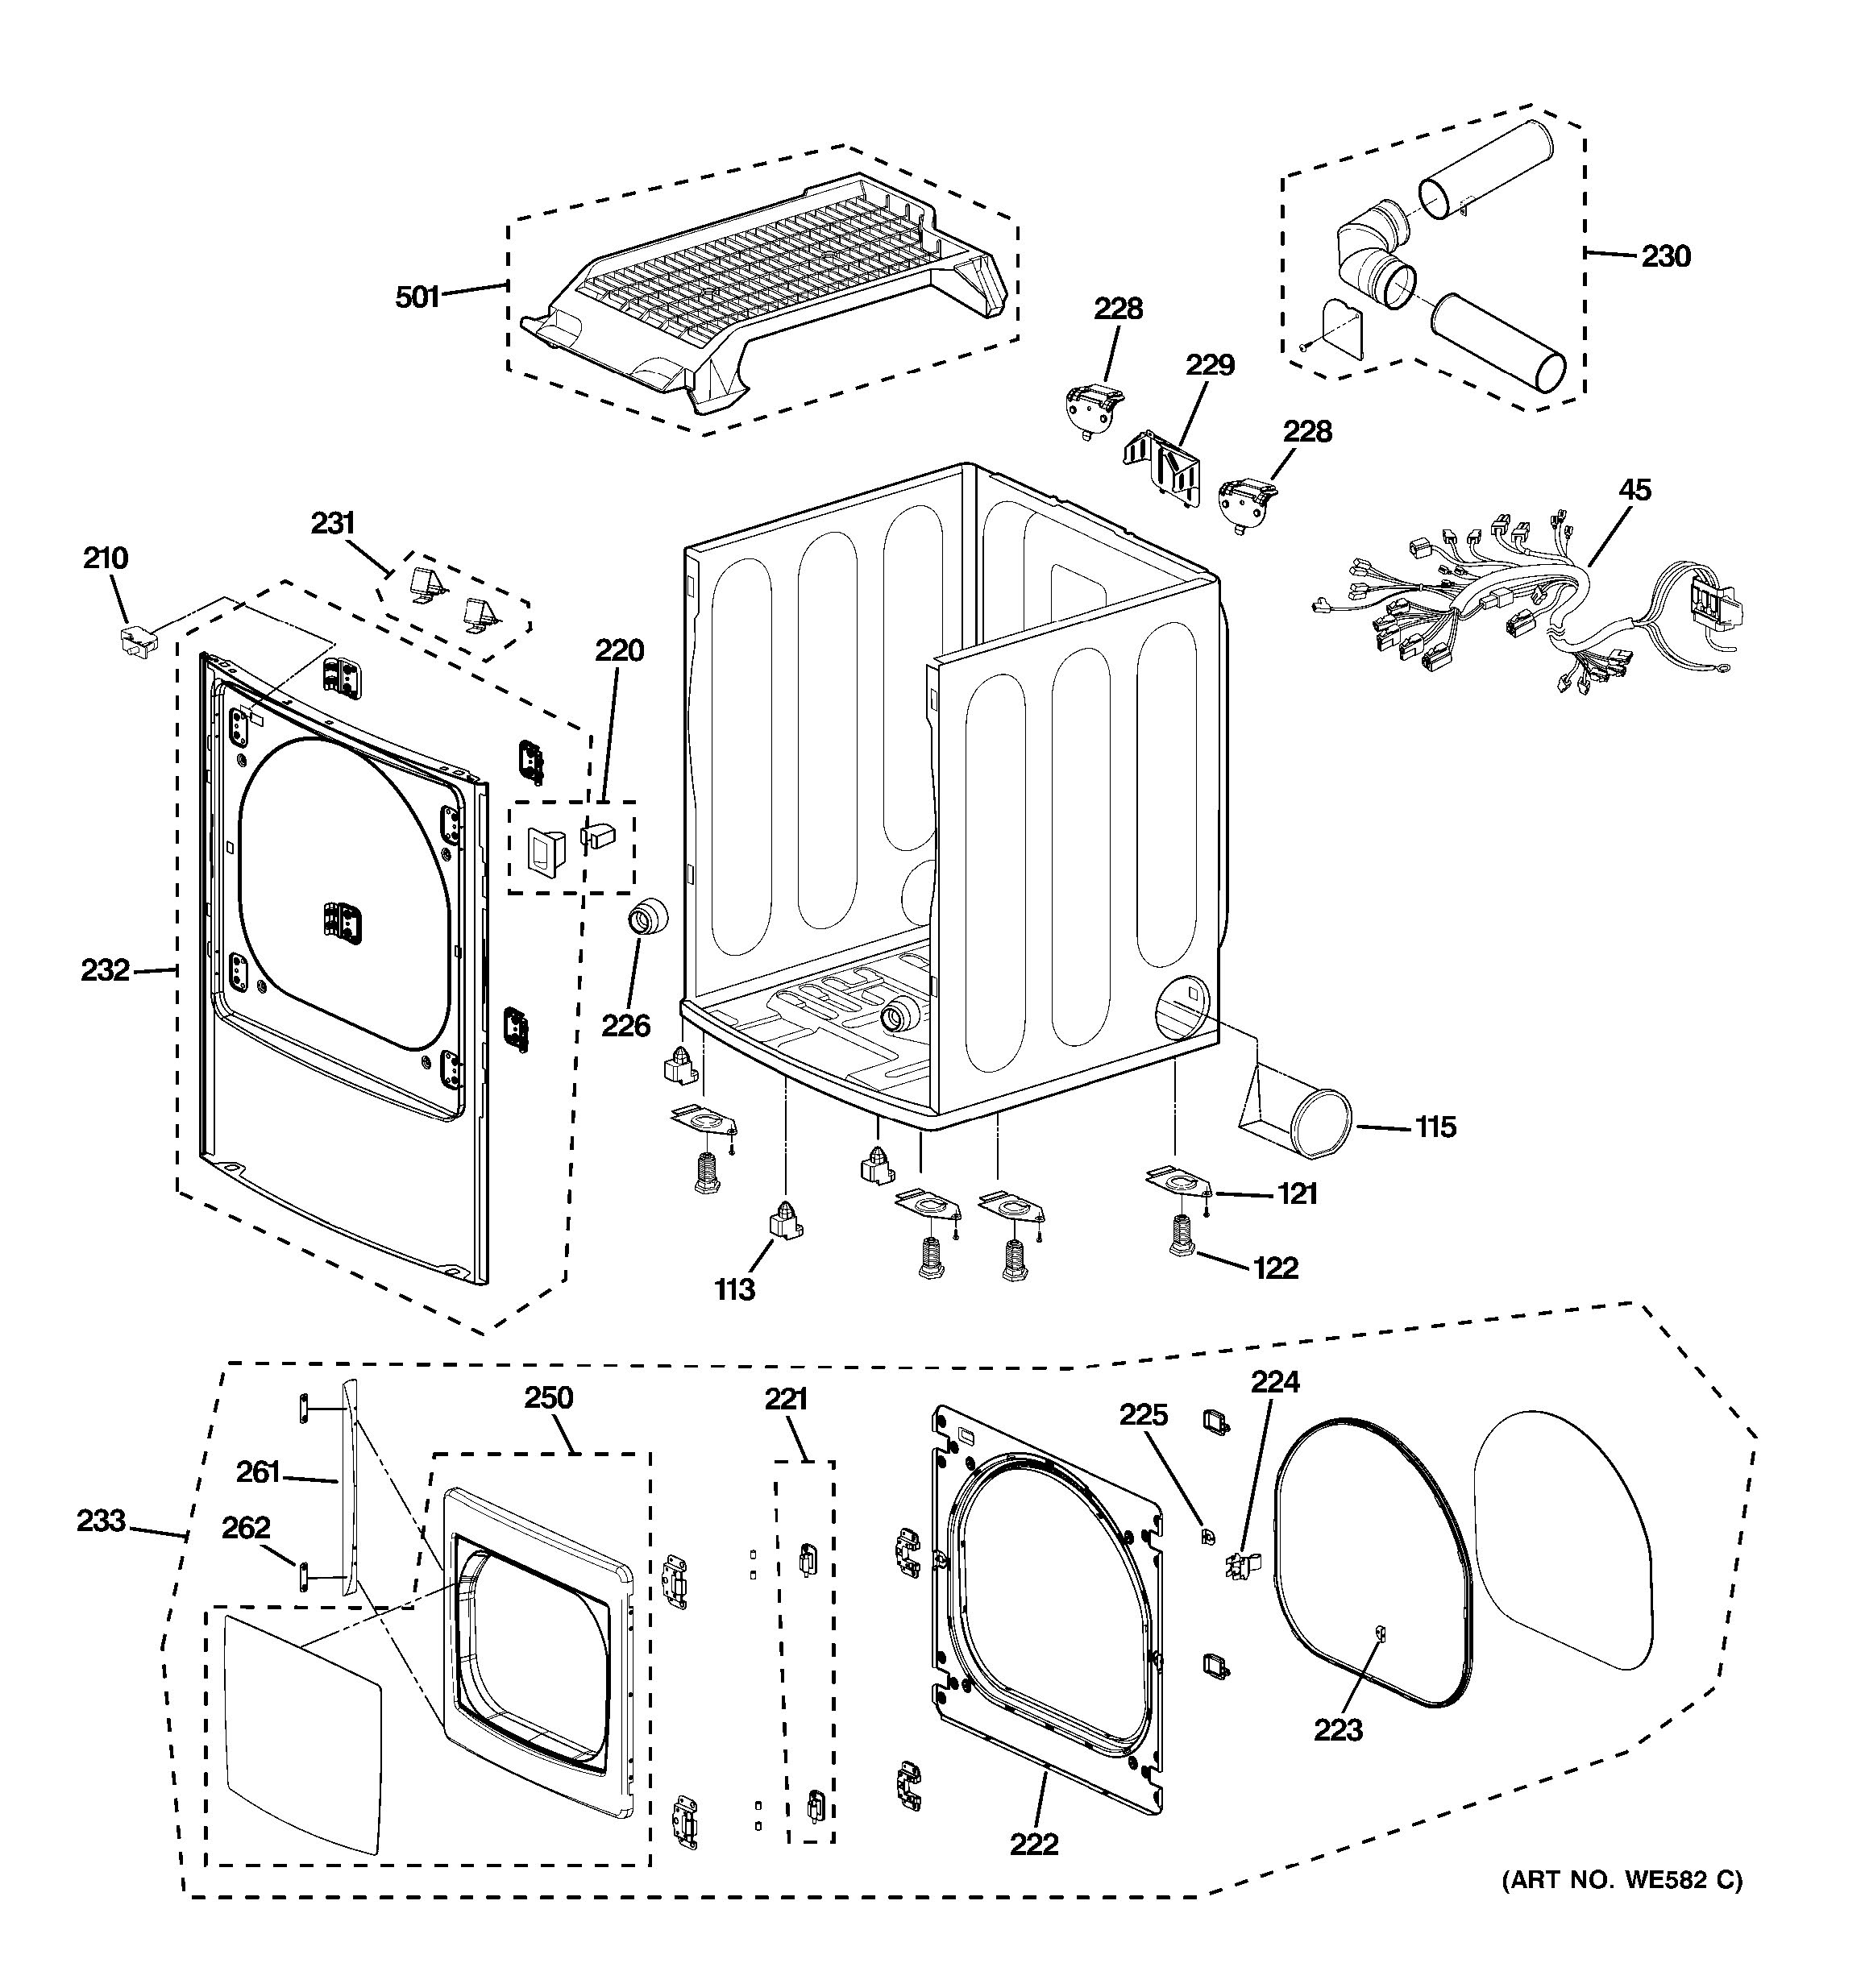 Main Lug Wiring